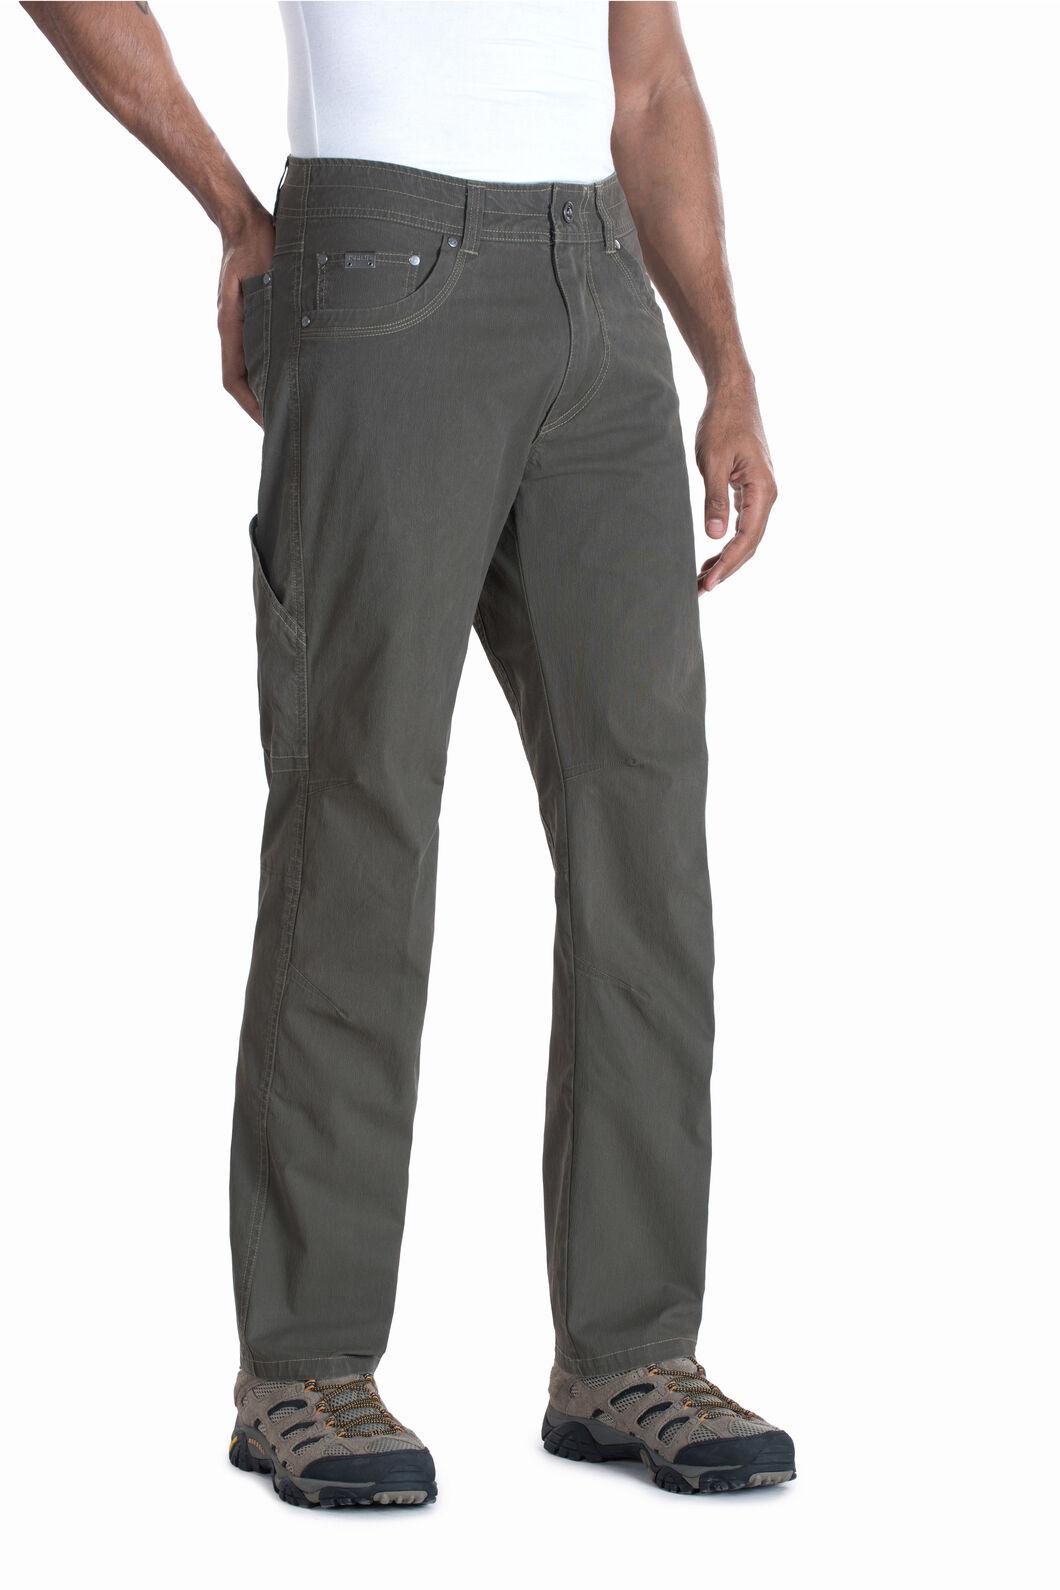 Kuhl Revolvr Pants (30 inch) - Men's, Gunmetal, hi-res